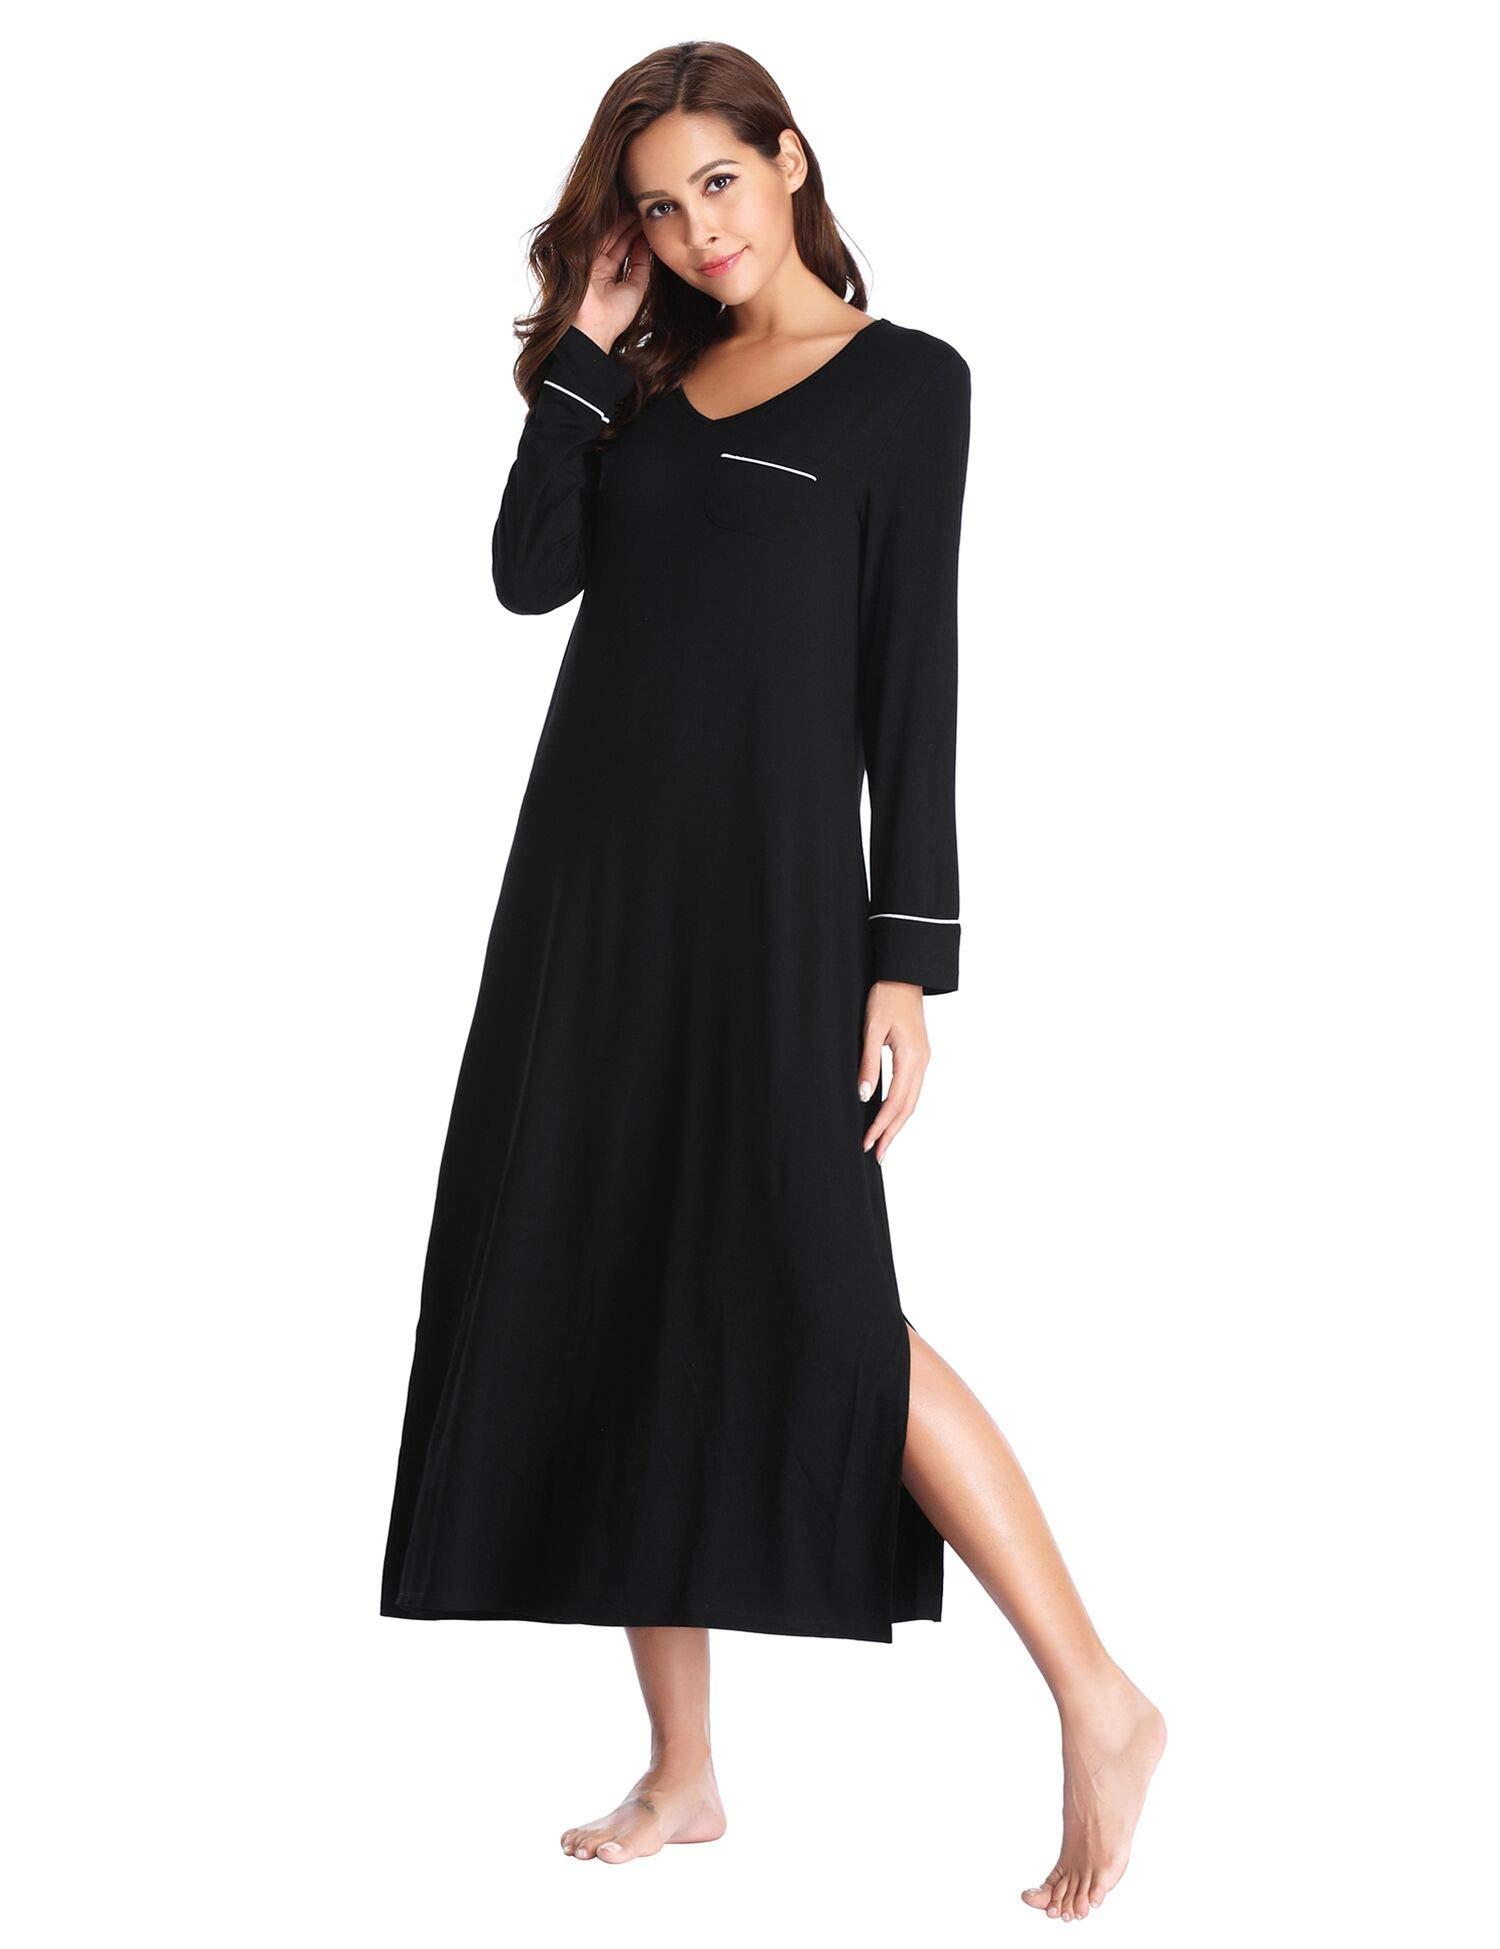 Lusofie Long Nightgowns for Women V-Neck Sleepshirts Soft Nightwear ...